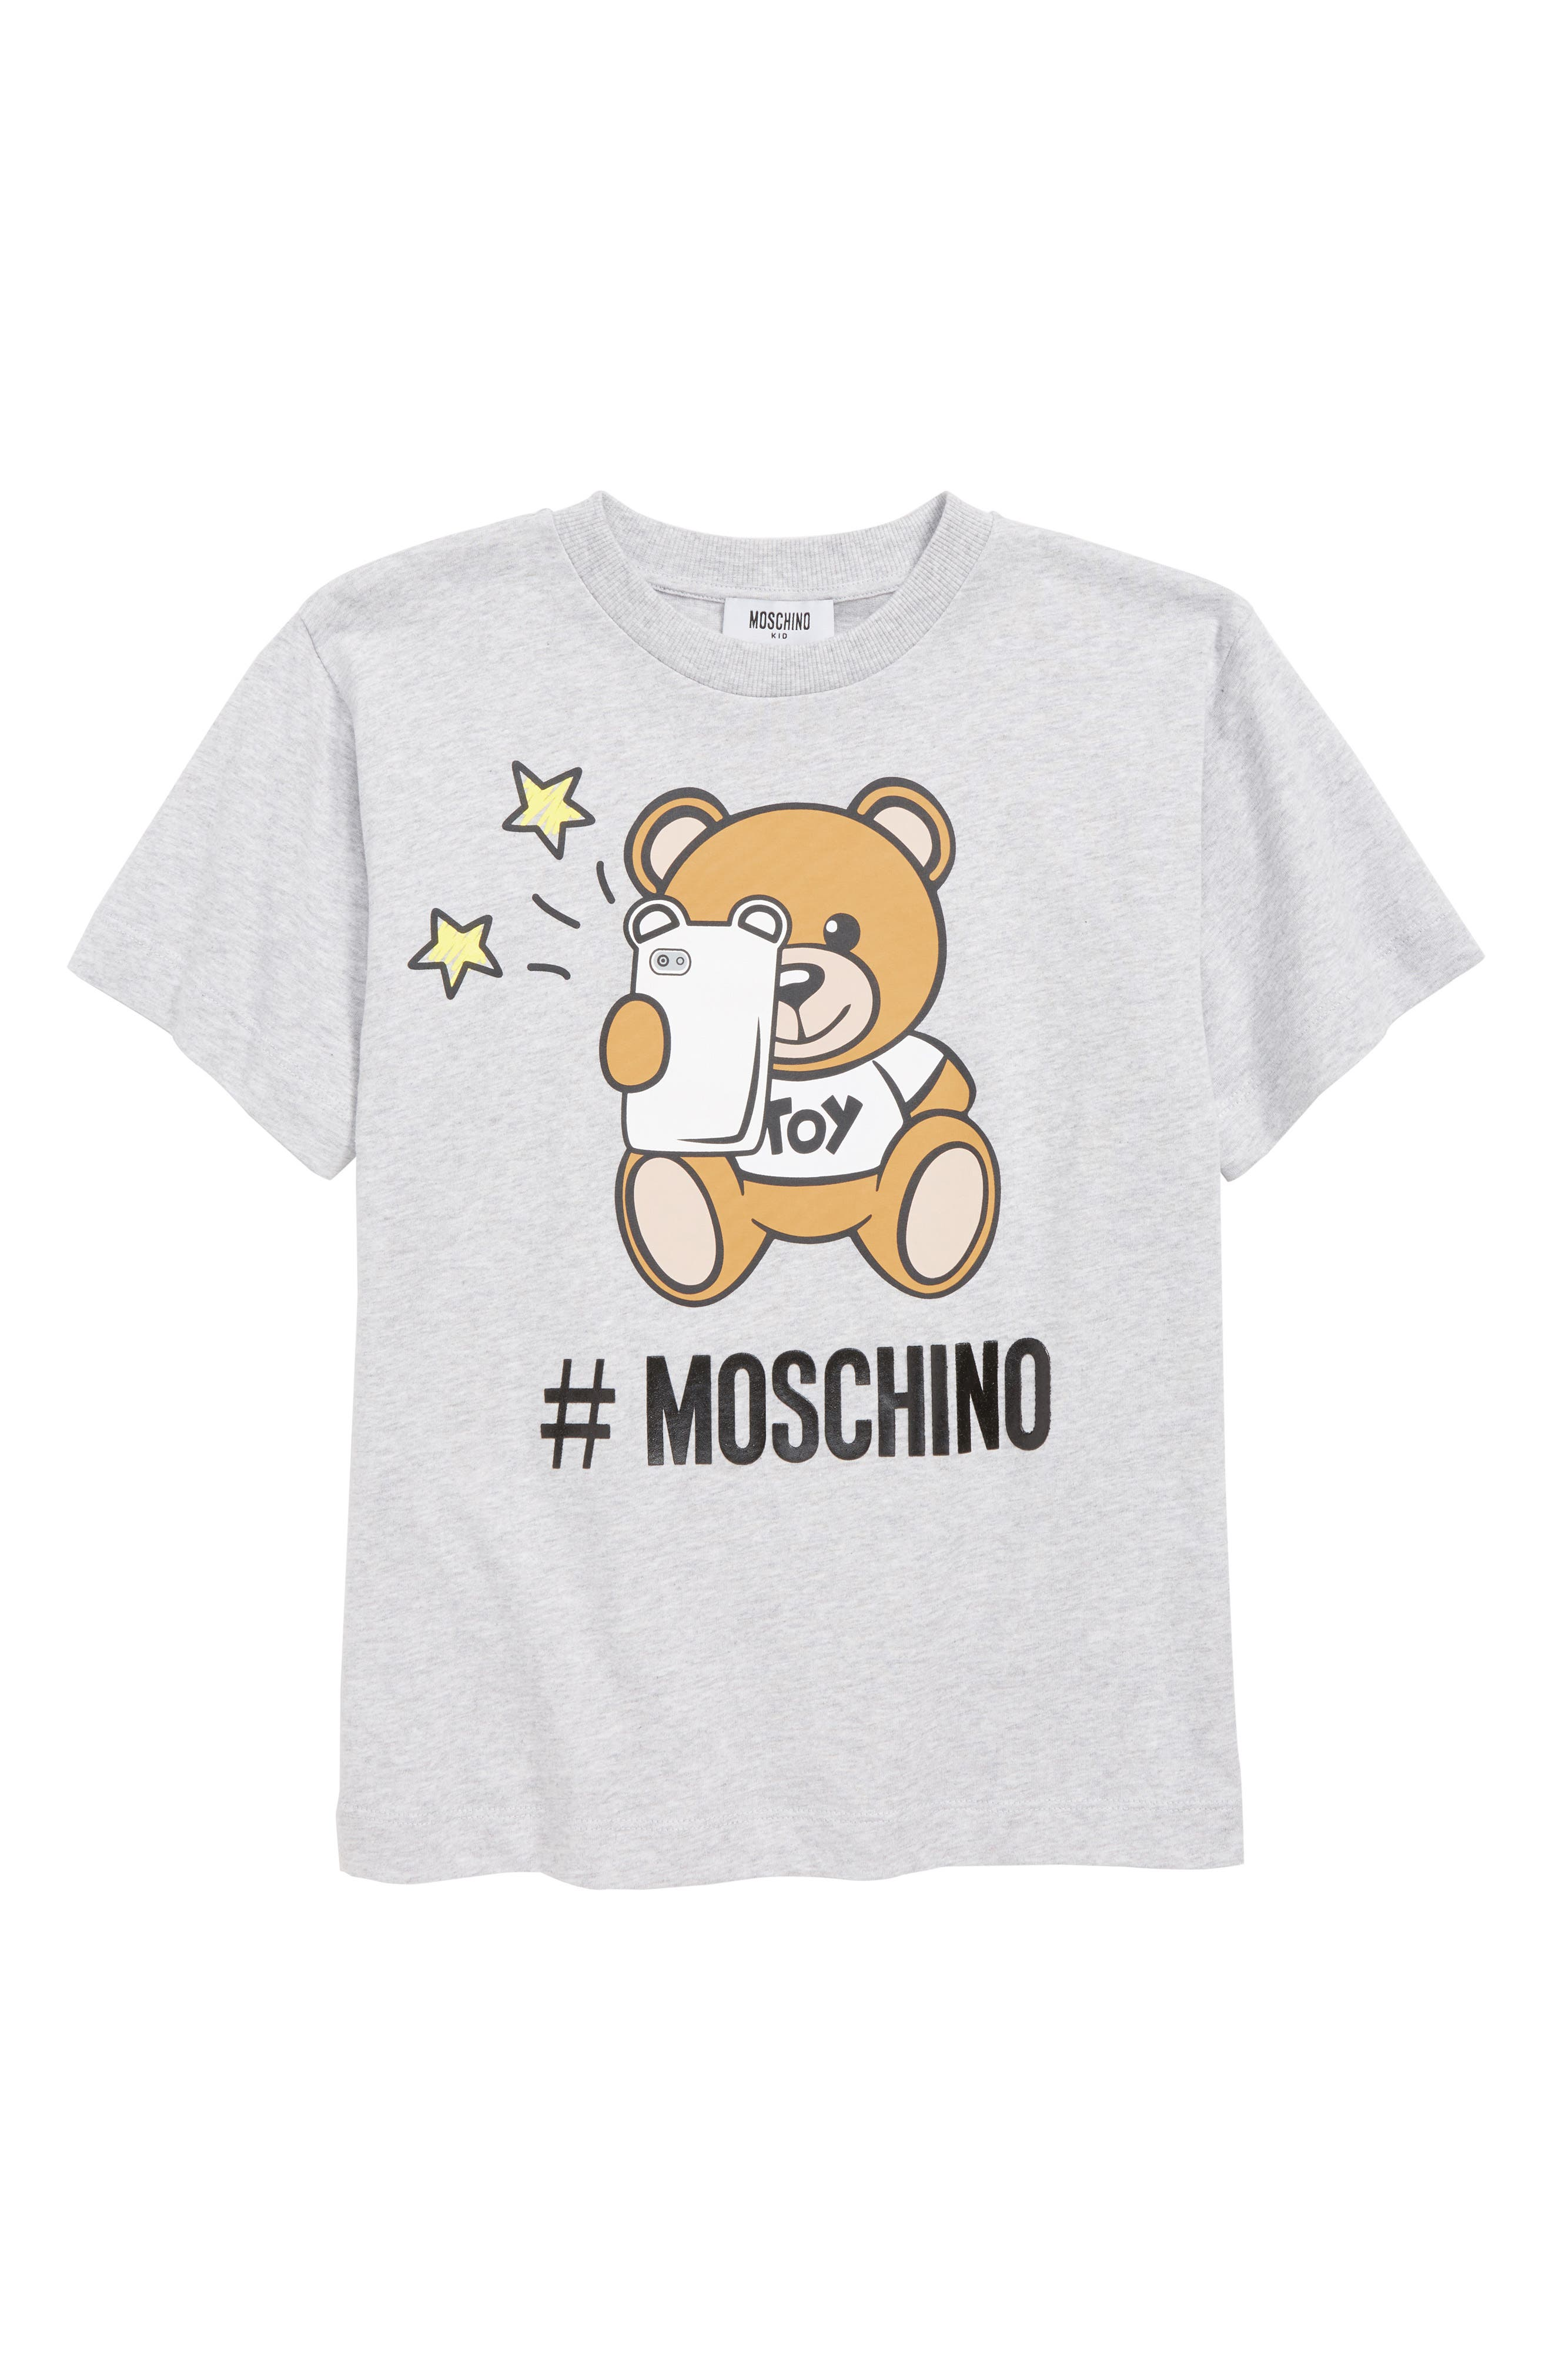 MOSCHINO Logo Teddy Bear & Phone Screenprint Tee, Main, color, 60901 GREY